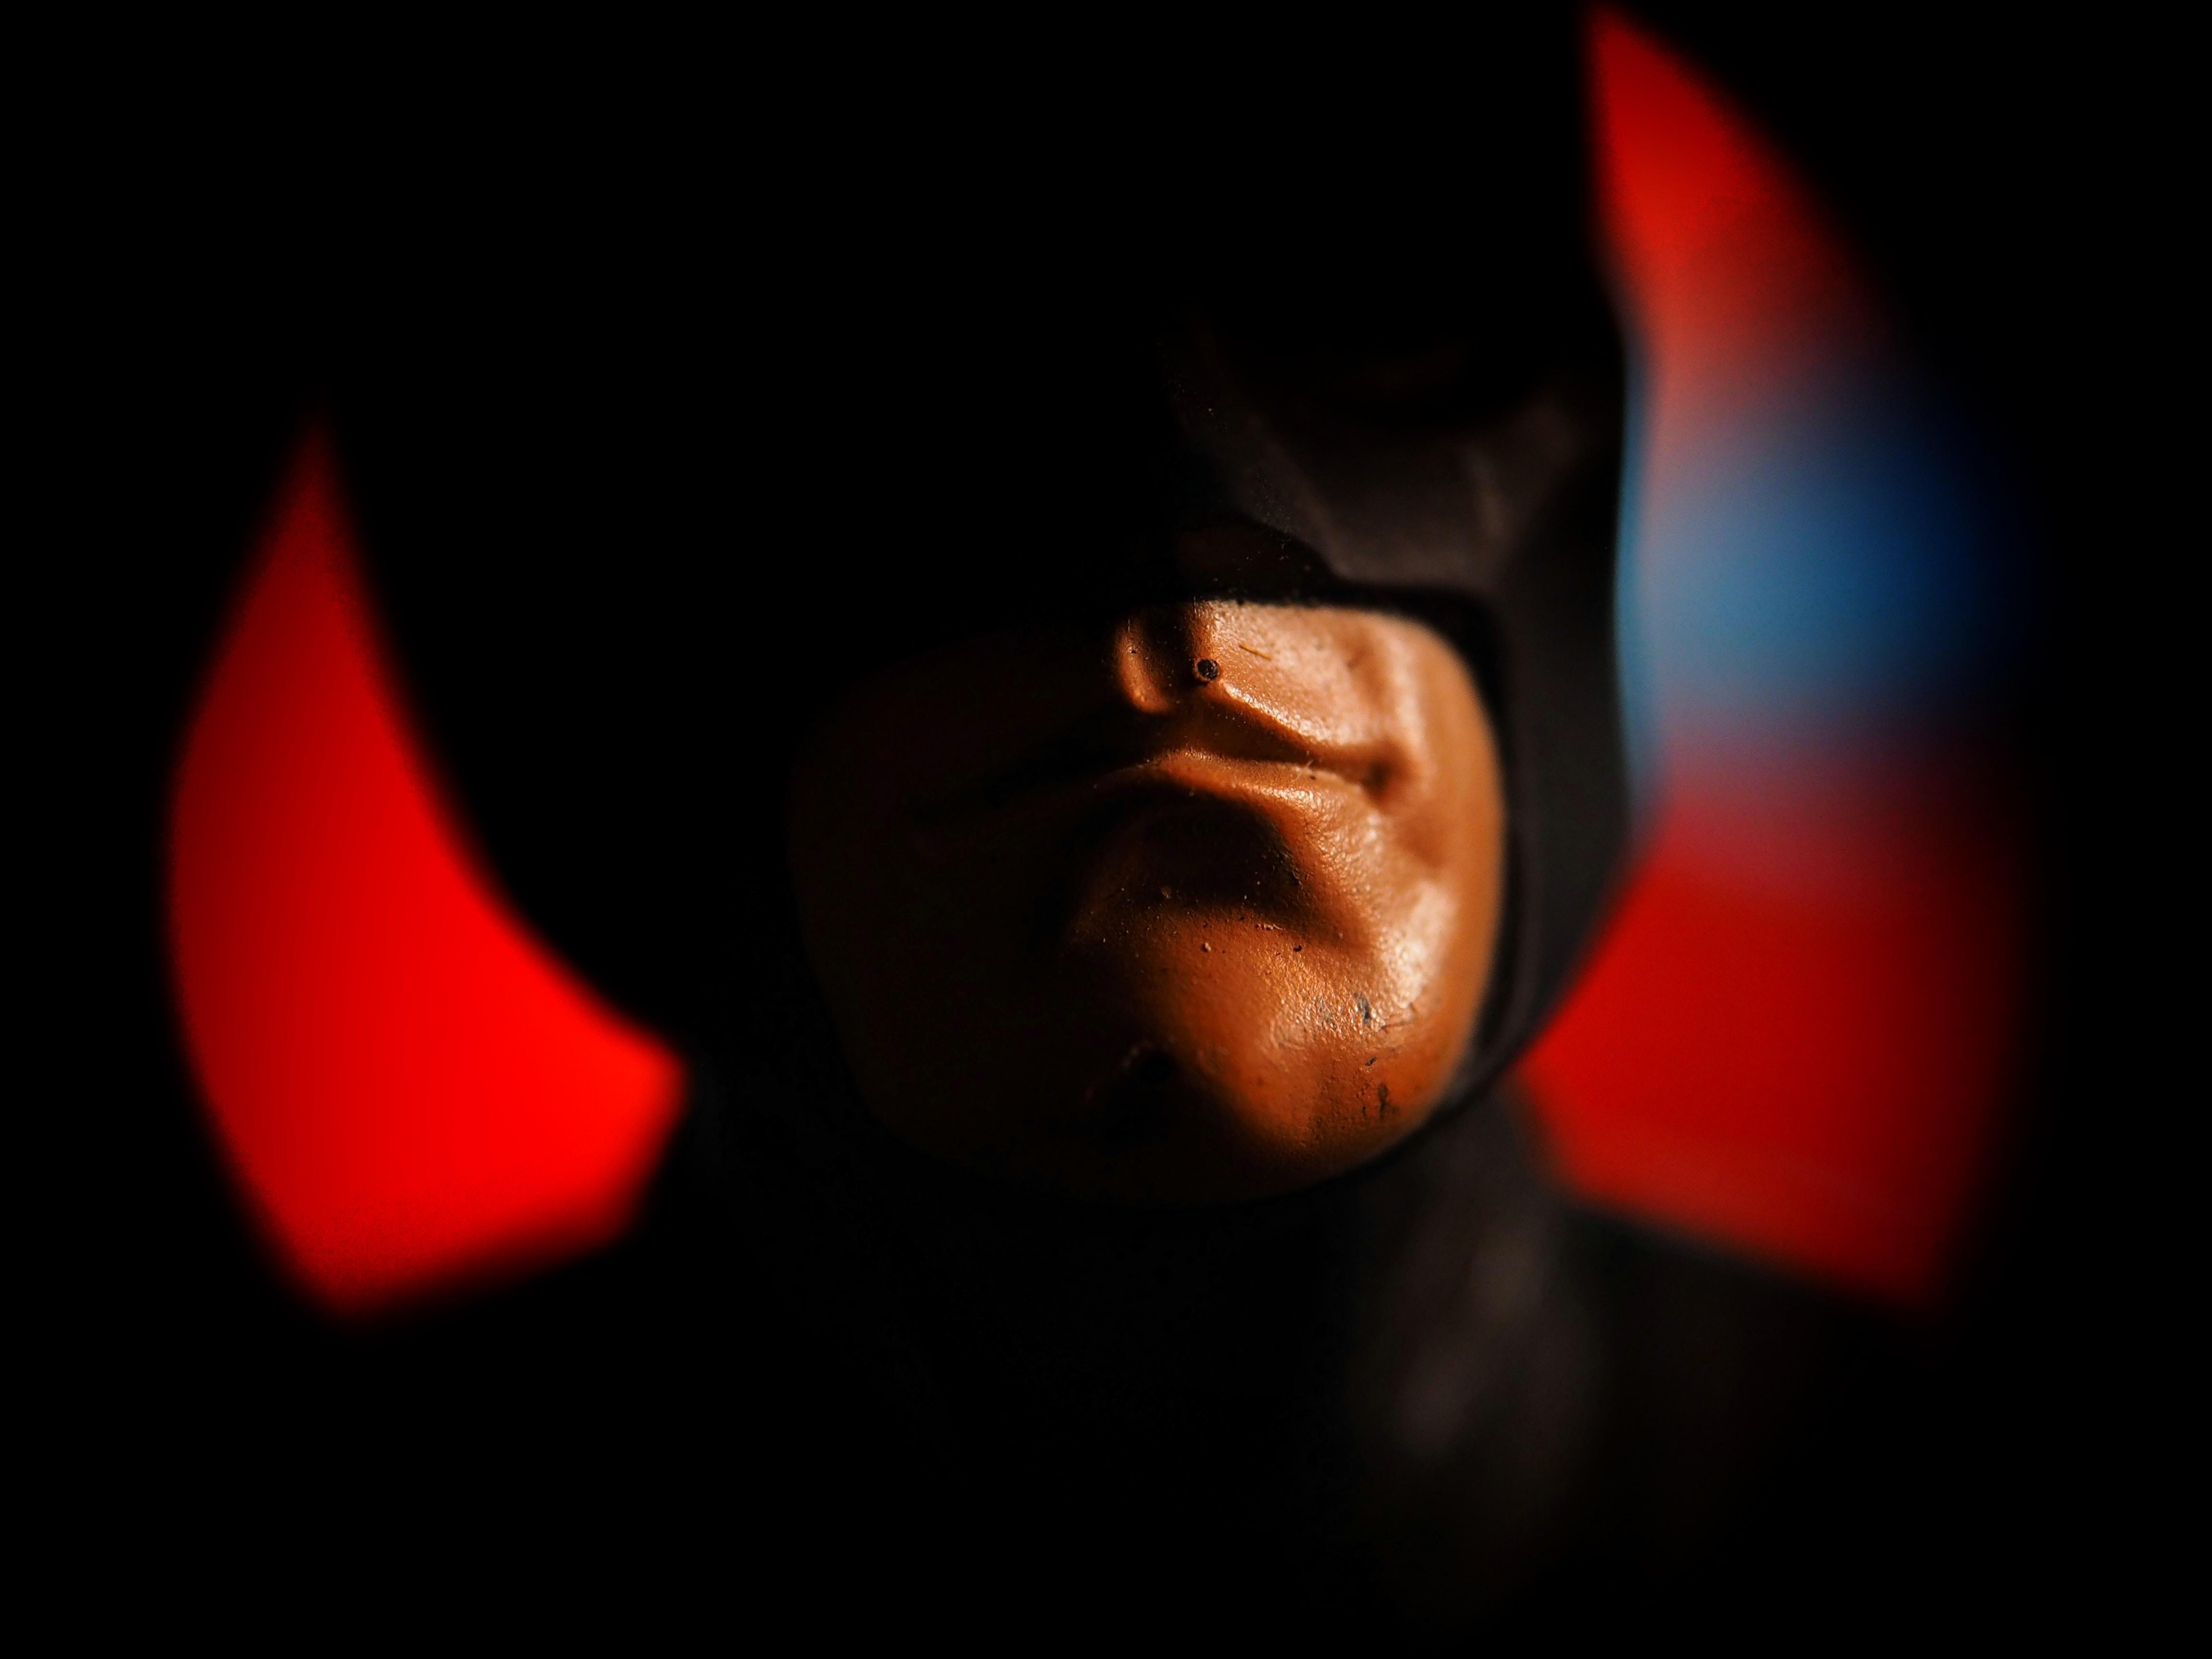 Close-up image of a Batman figurine